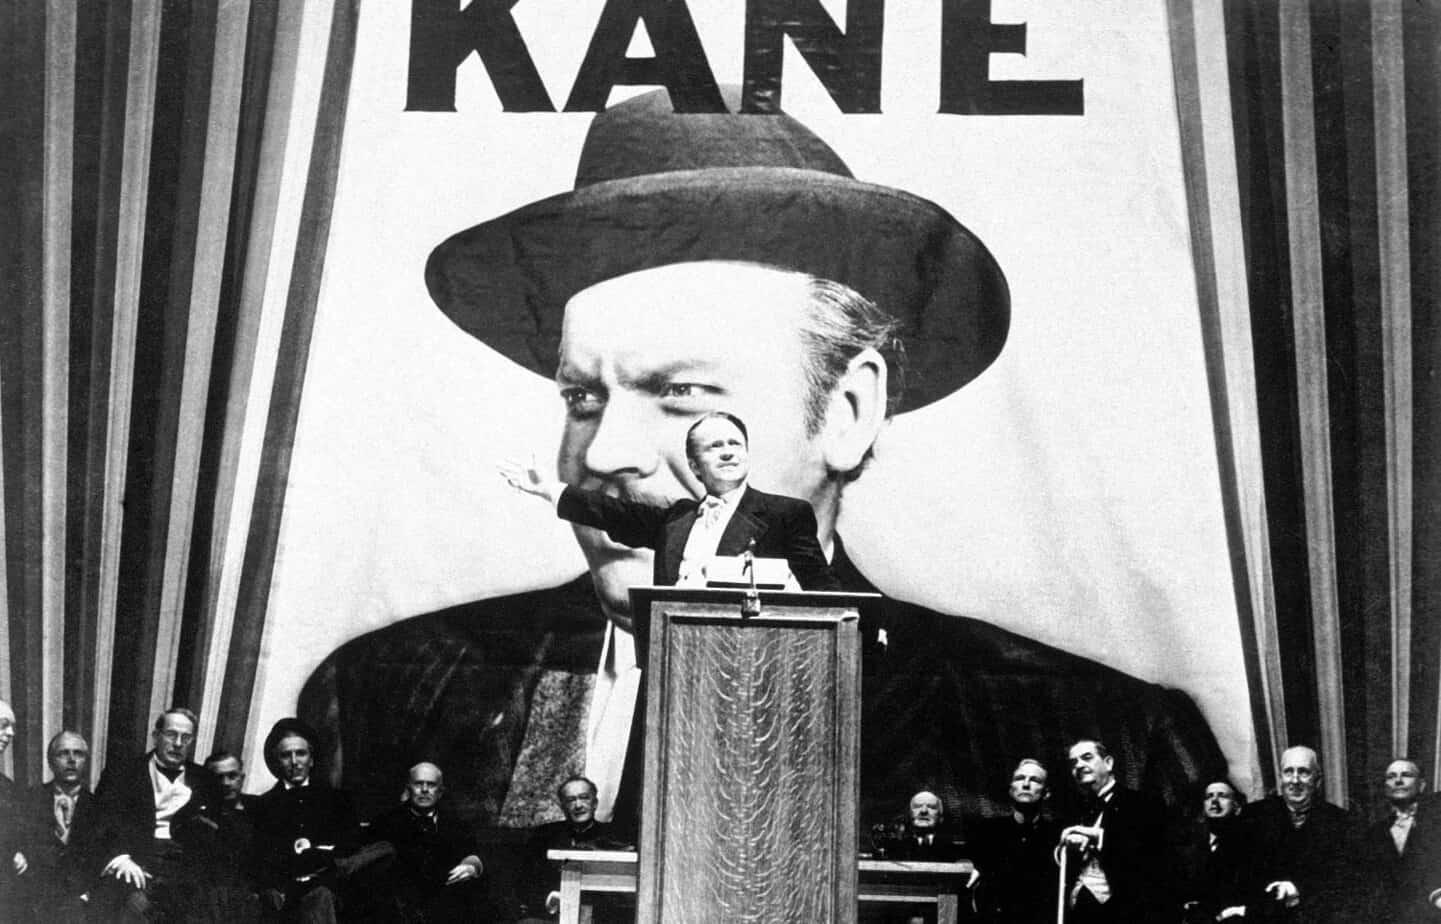 Obywatel Kane film